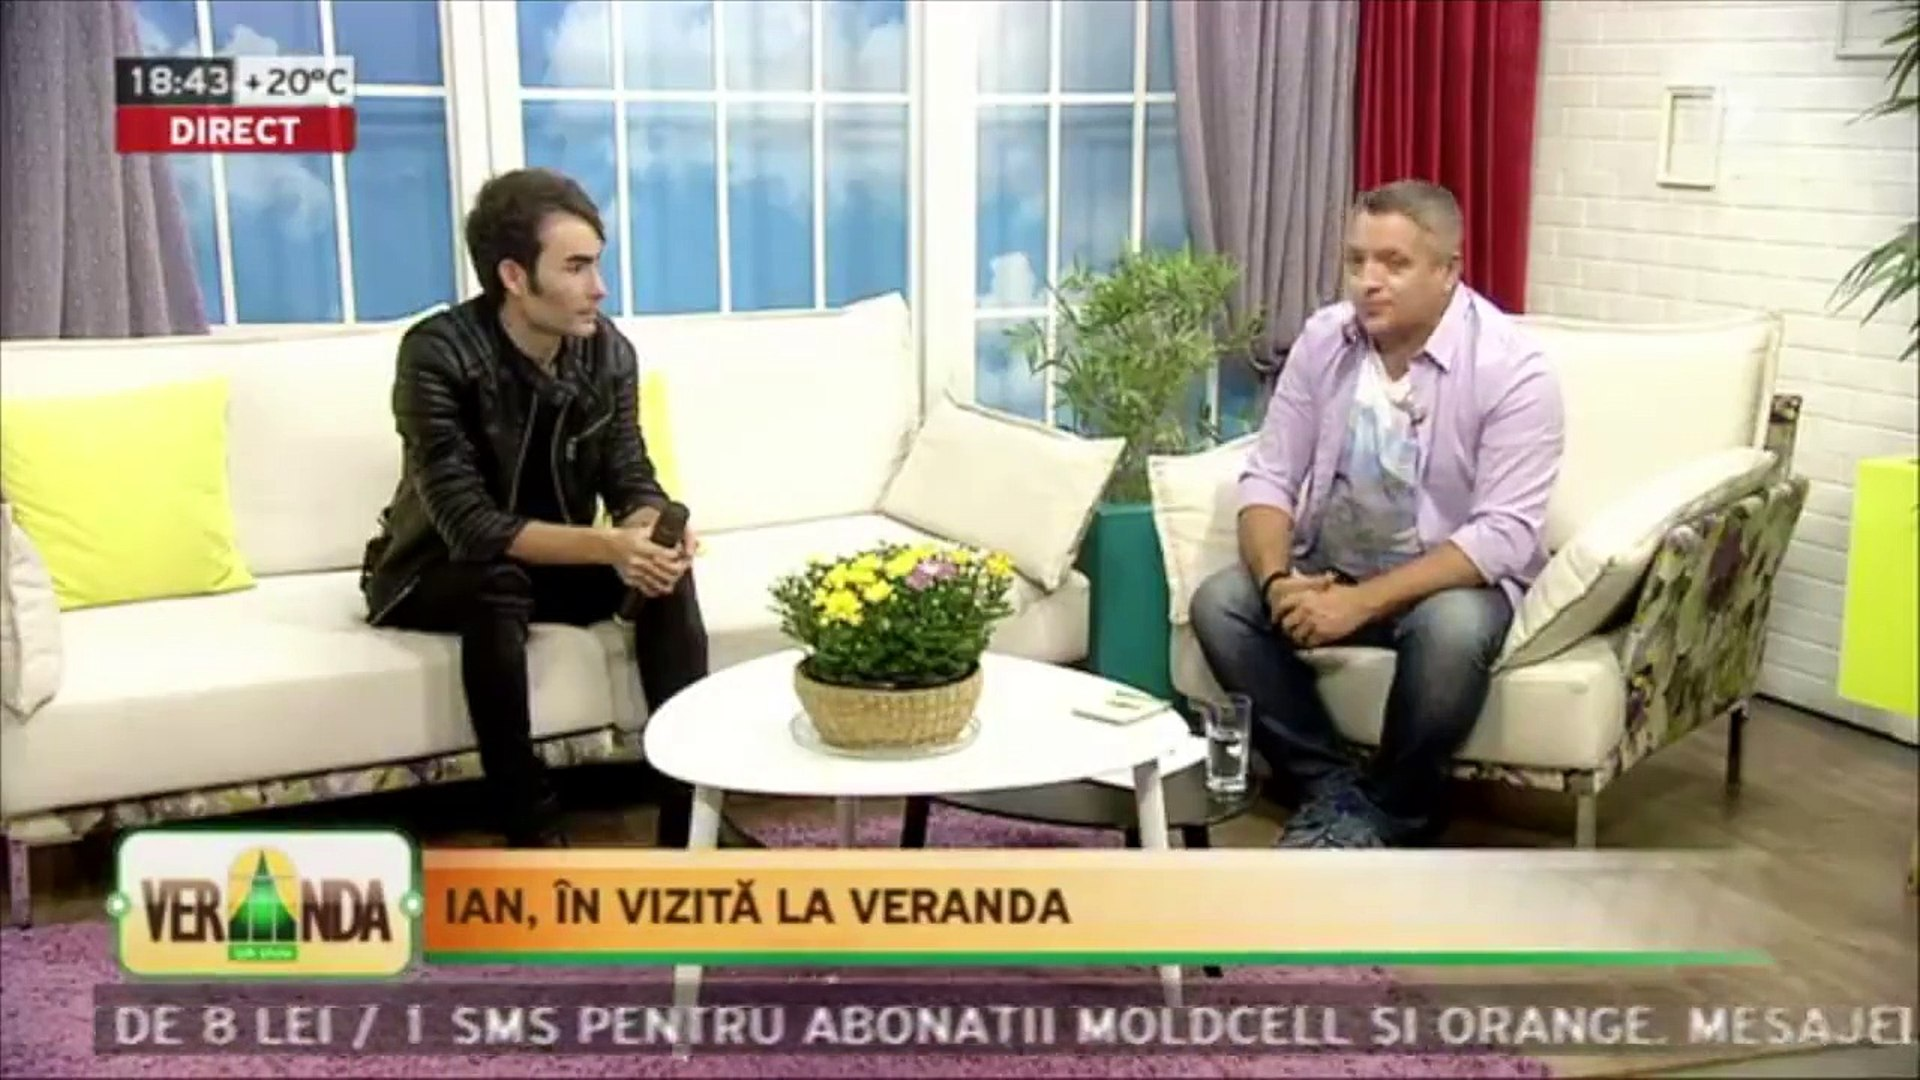 Veranda online jurnal tv